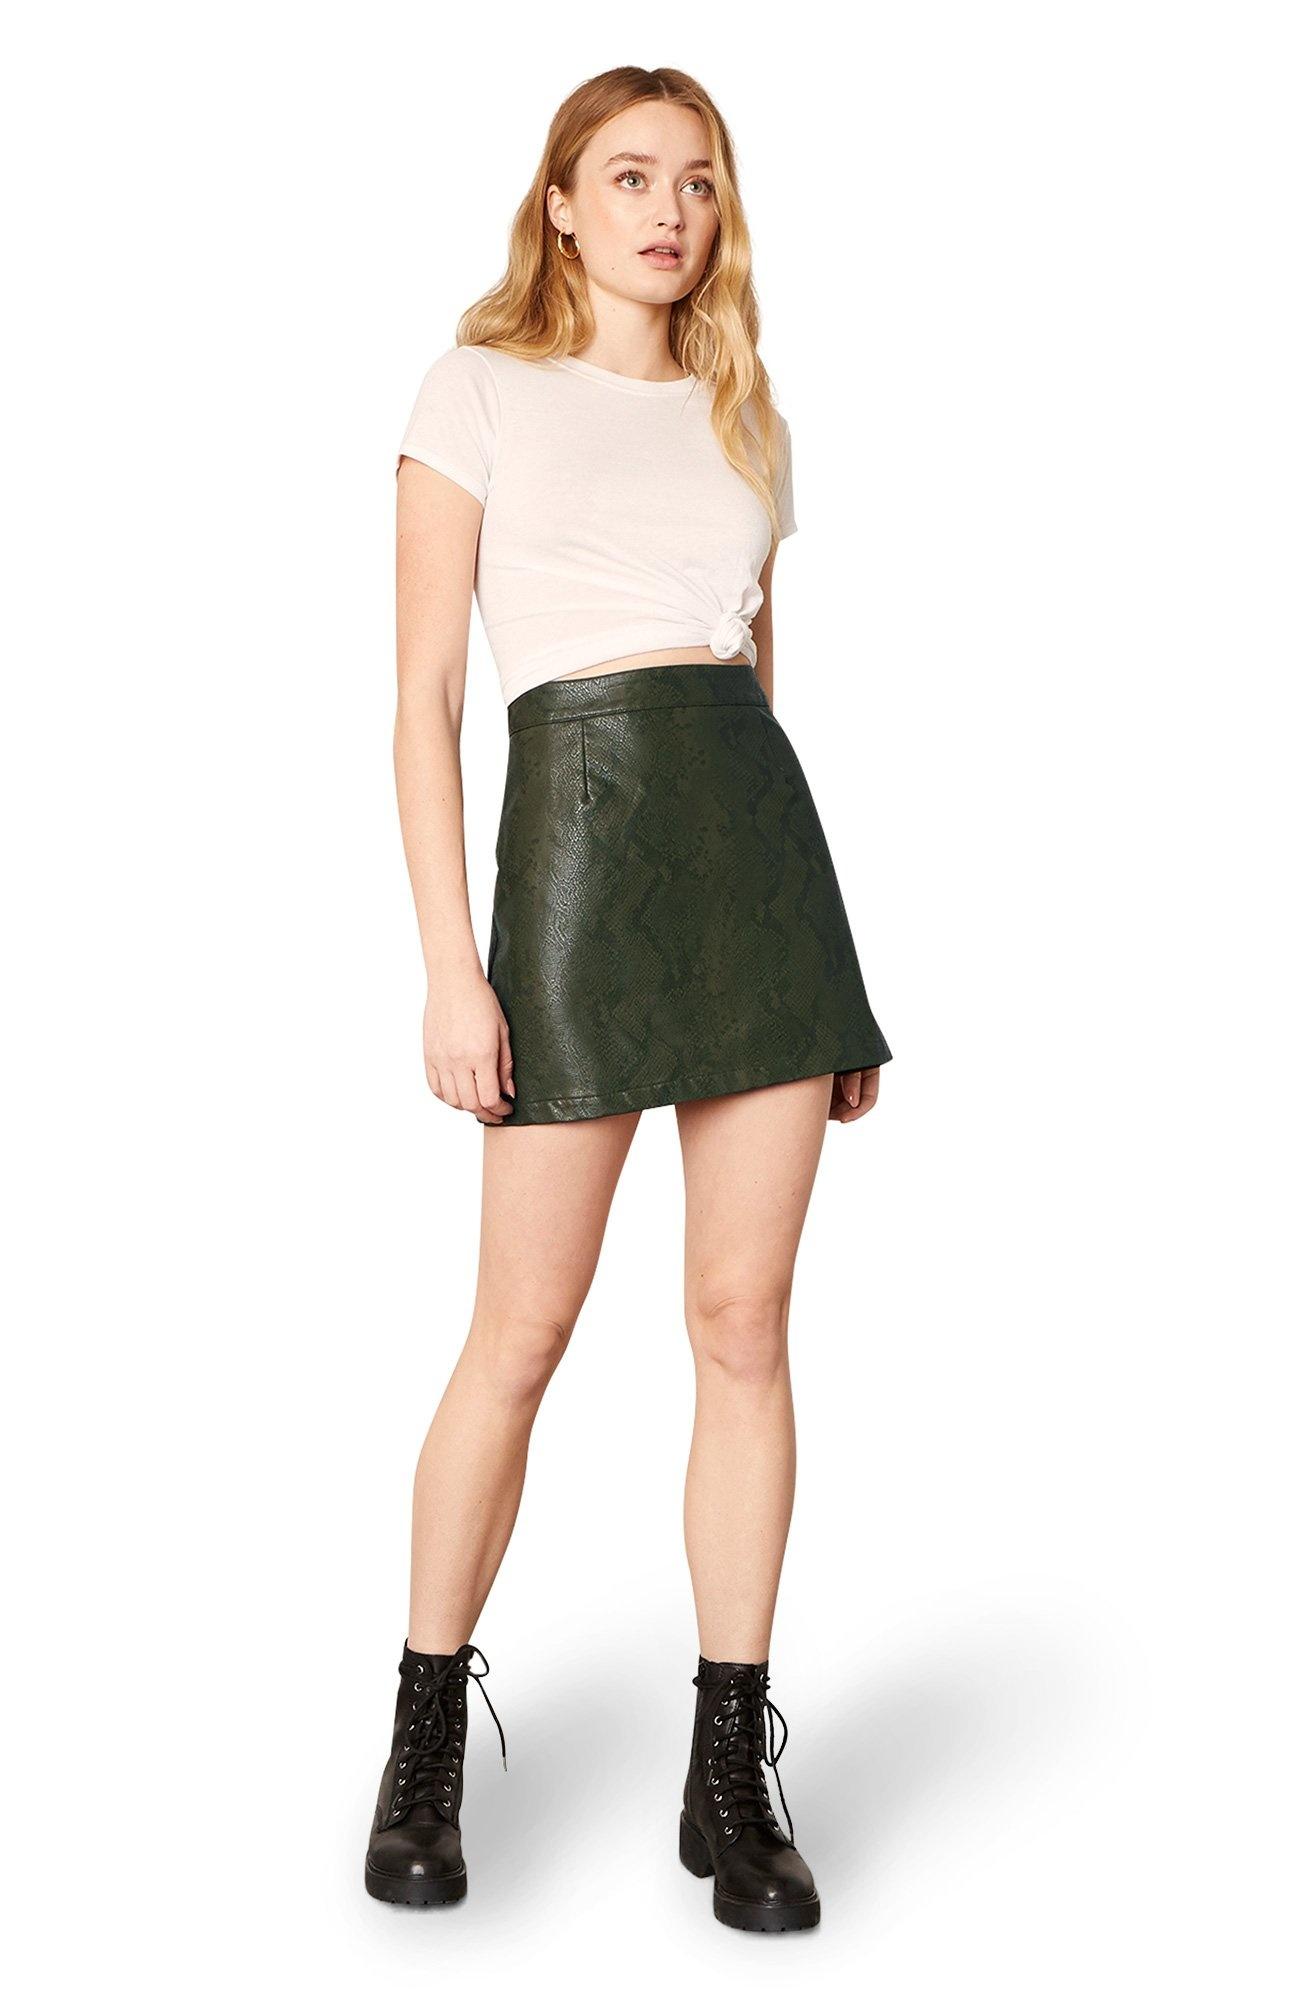 Jack by BB Dakota Snake A Leg Army Green Skirt